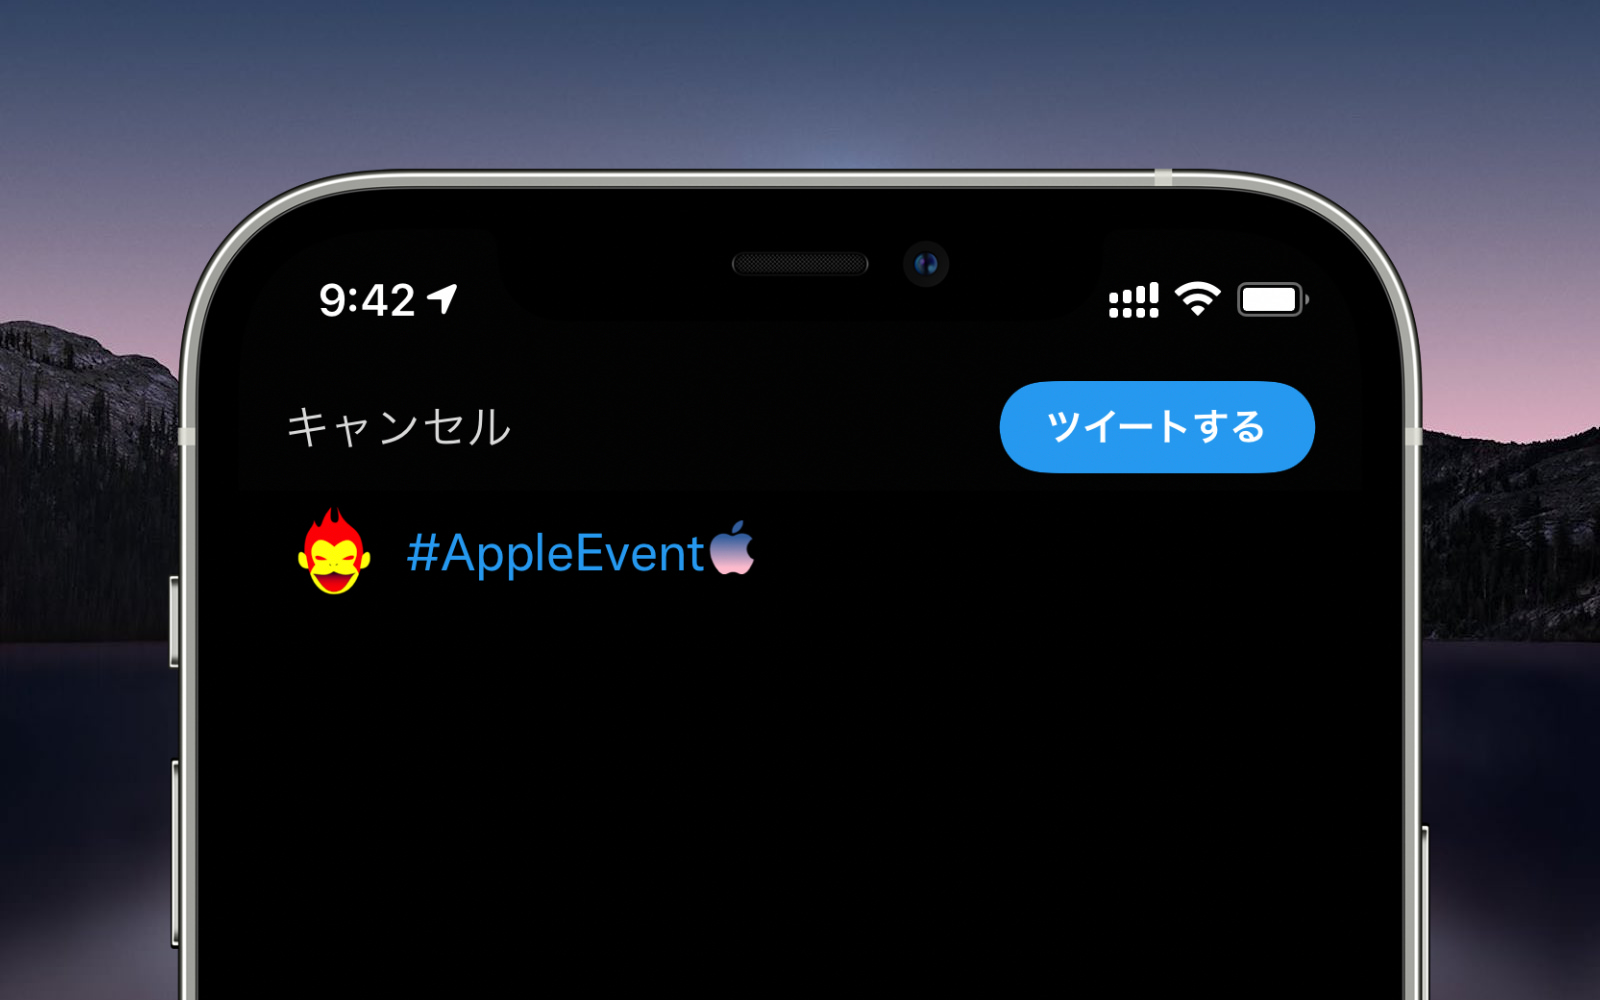 AppleEvent Hashtag 2021Sep